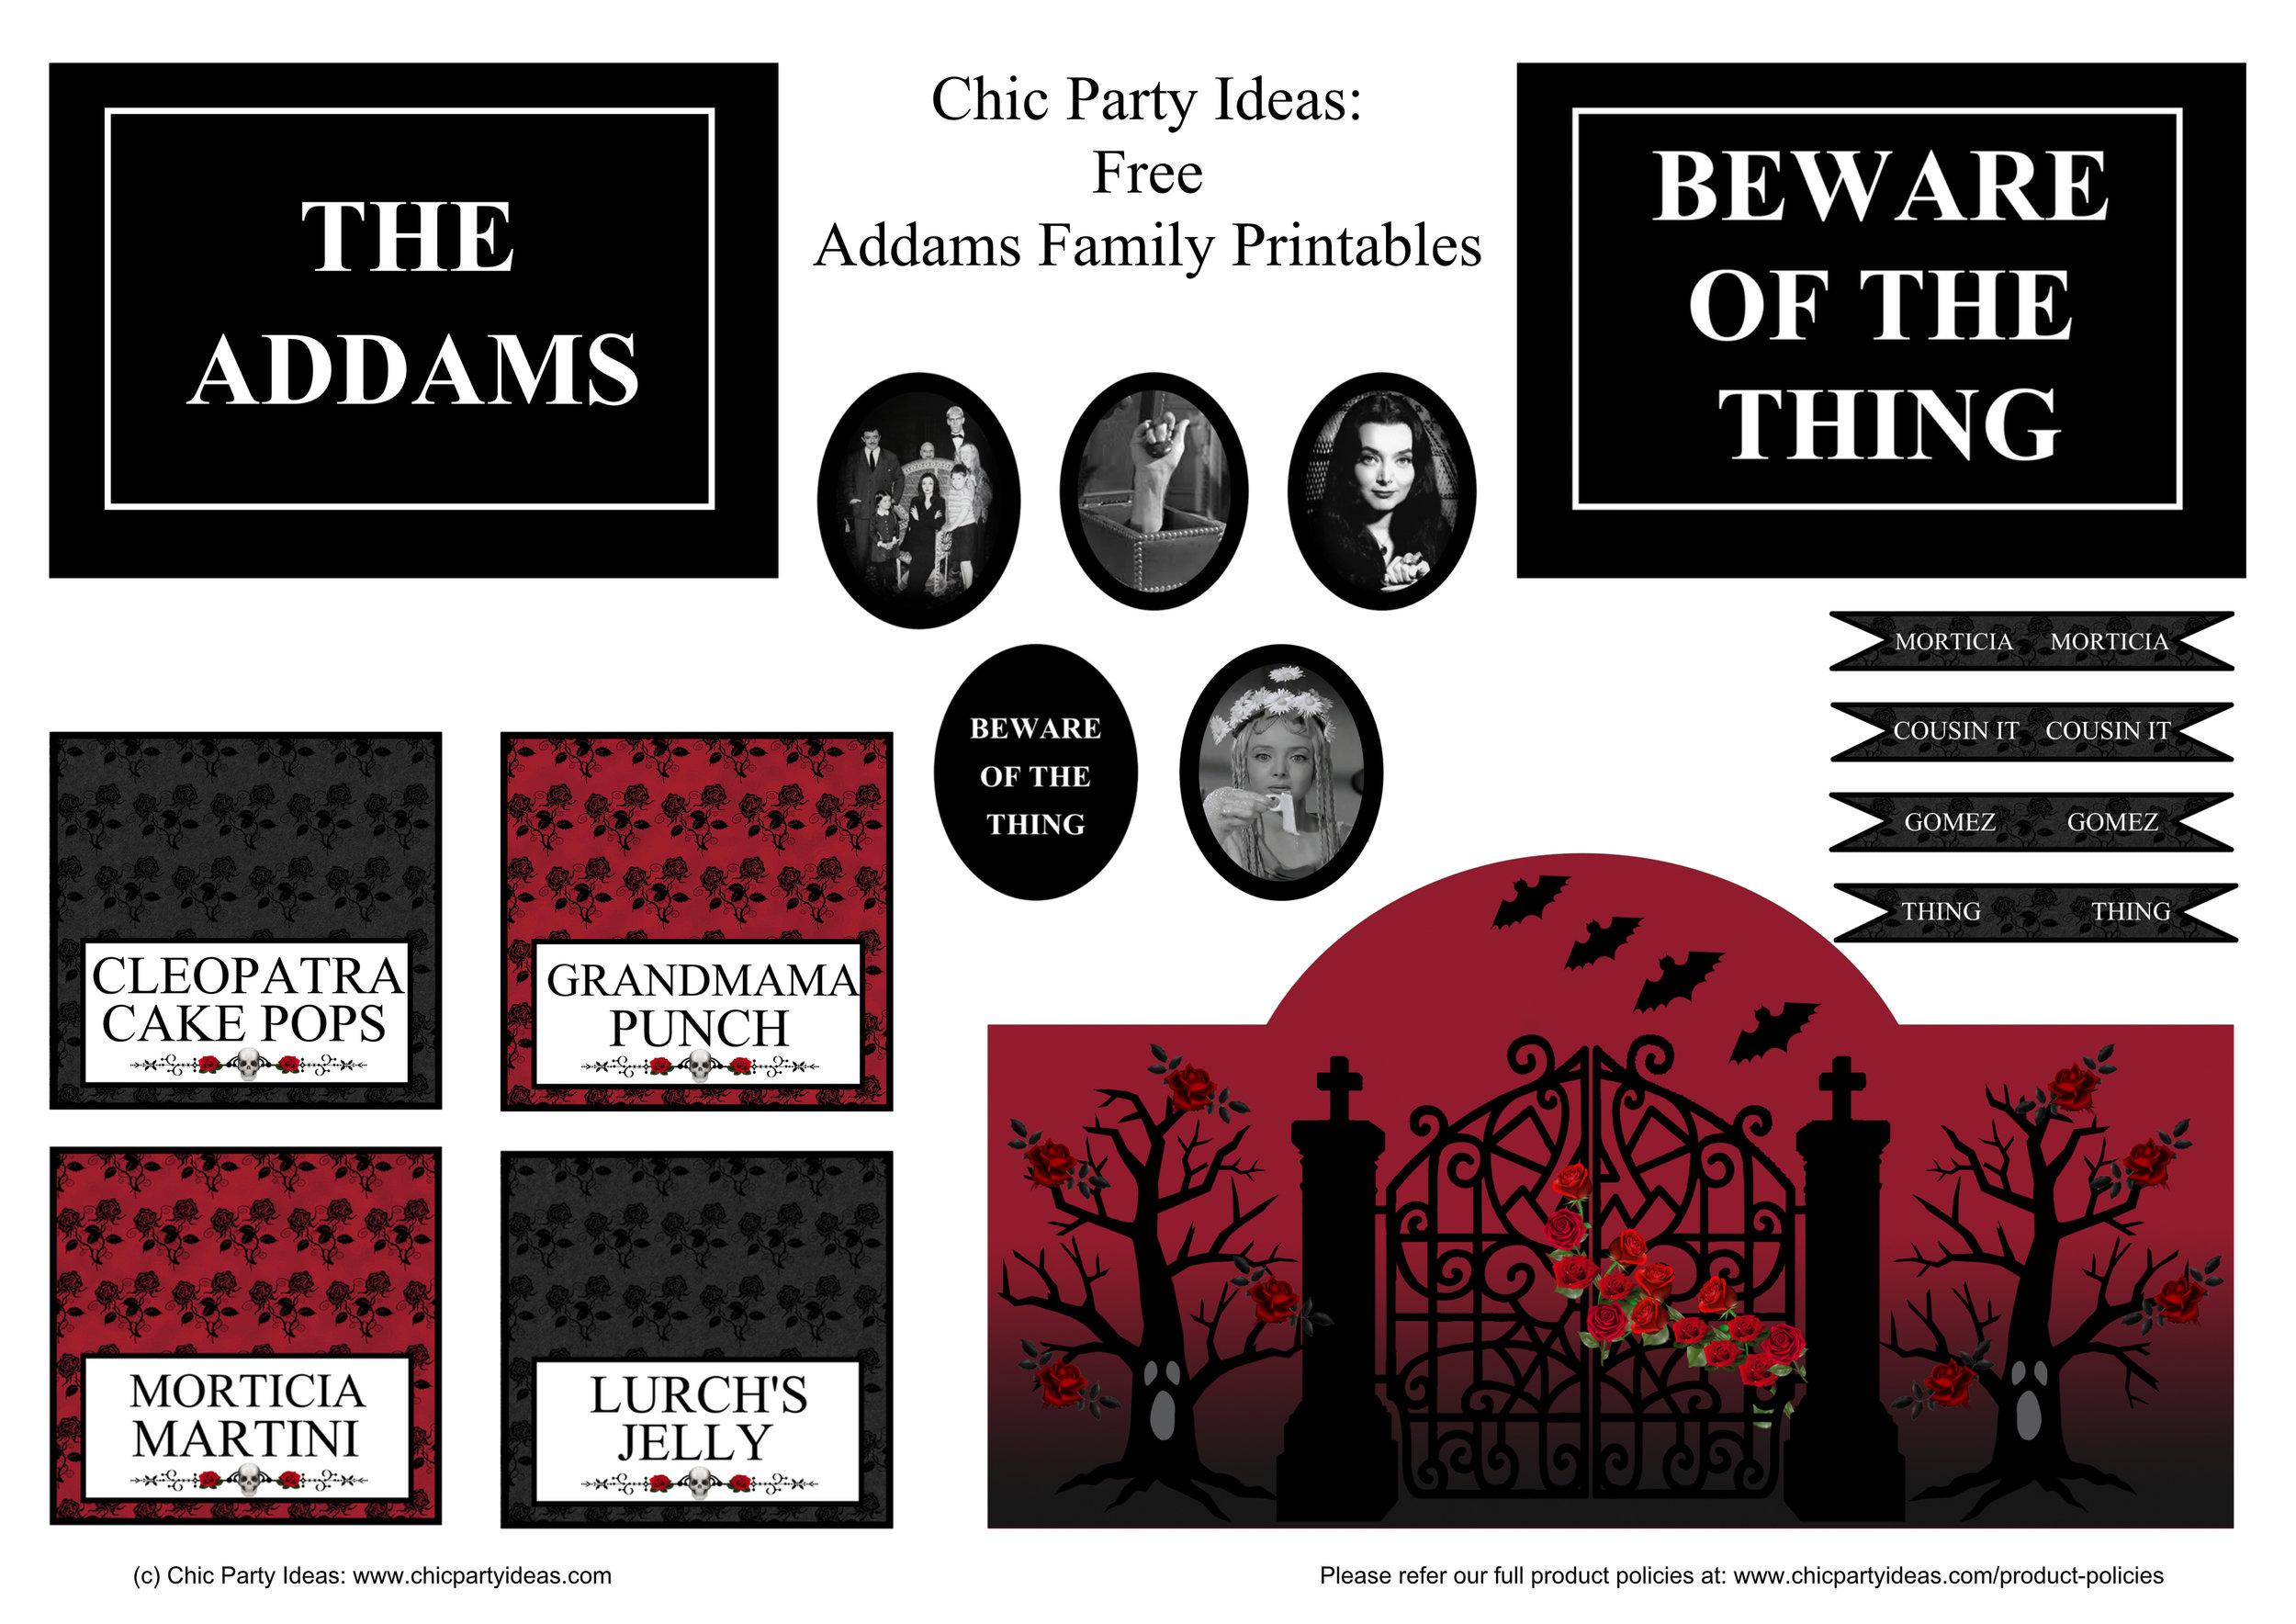 The Addams Family Free Printables - www.chicpartyideas.com.au